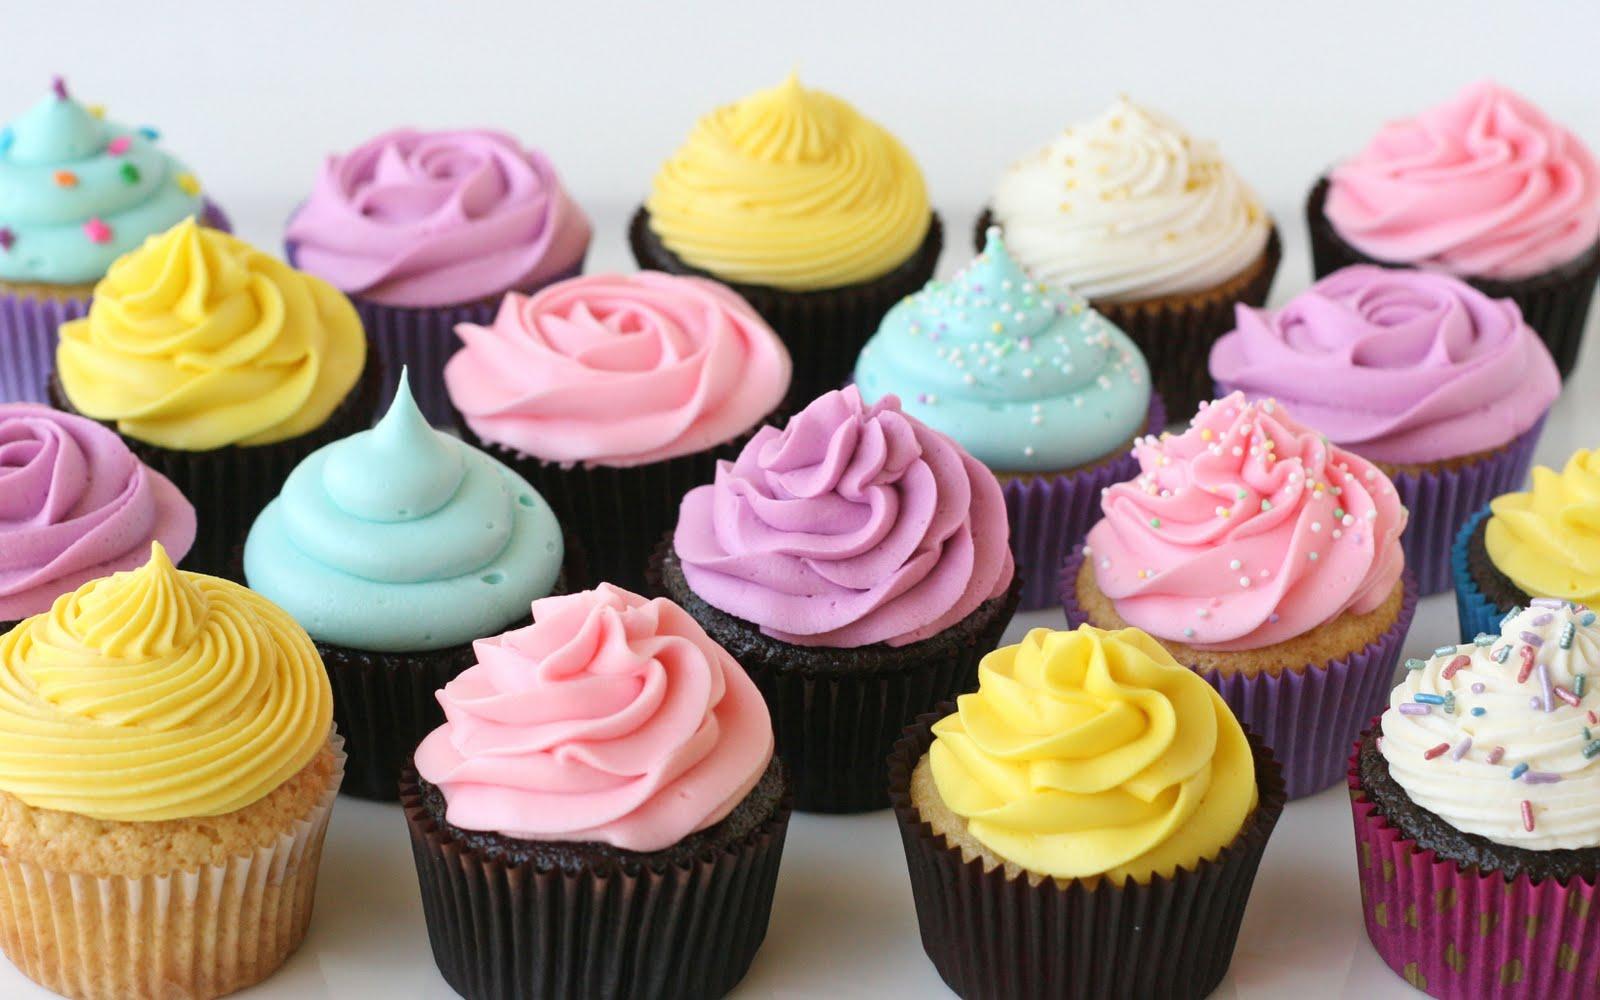 Cupcakes - Cupcakes